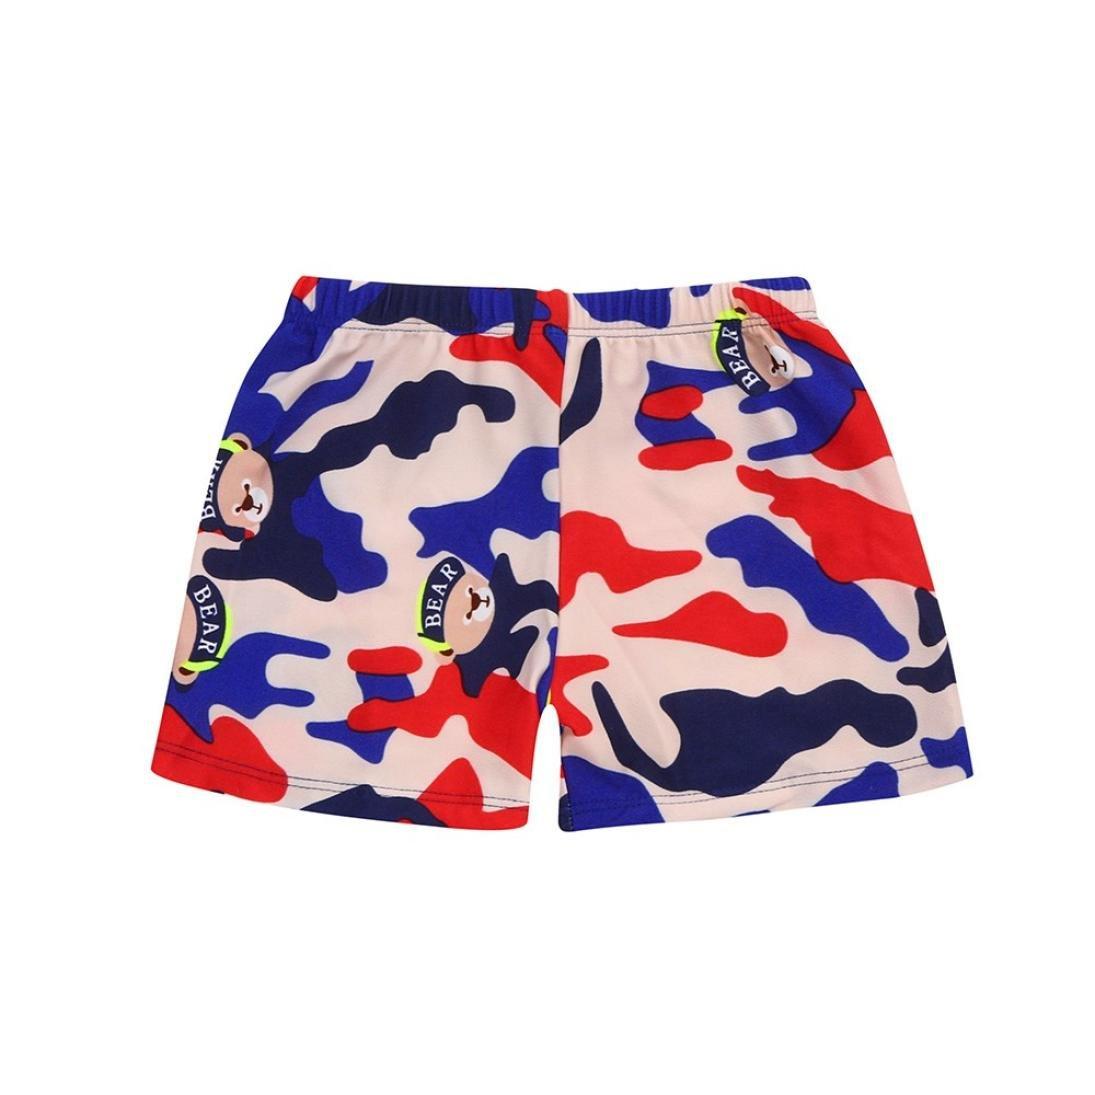 Efaster Kid Children Boys Cartoon Pattern Print Beach Swimsuit Swimwear Shorts (Khaki, 4-6 T)